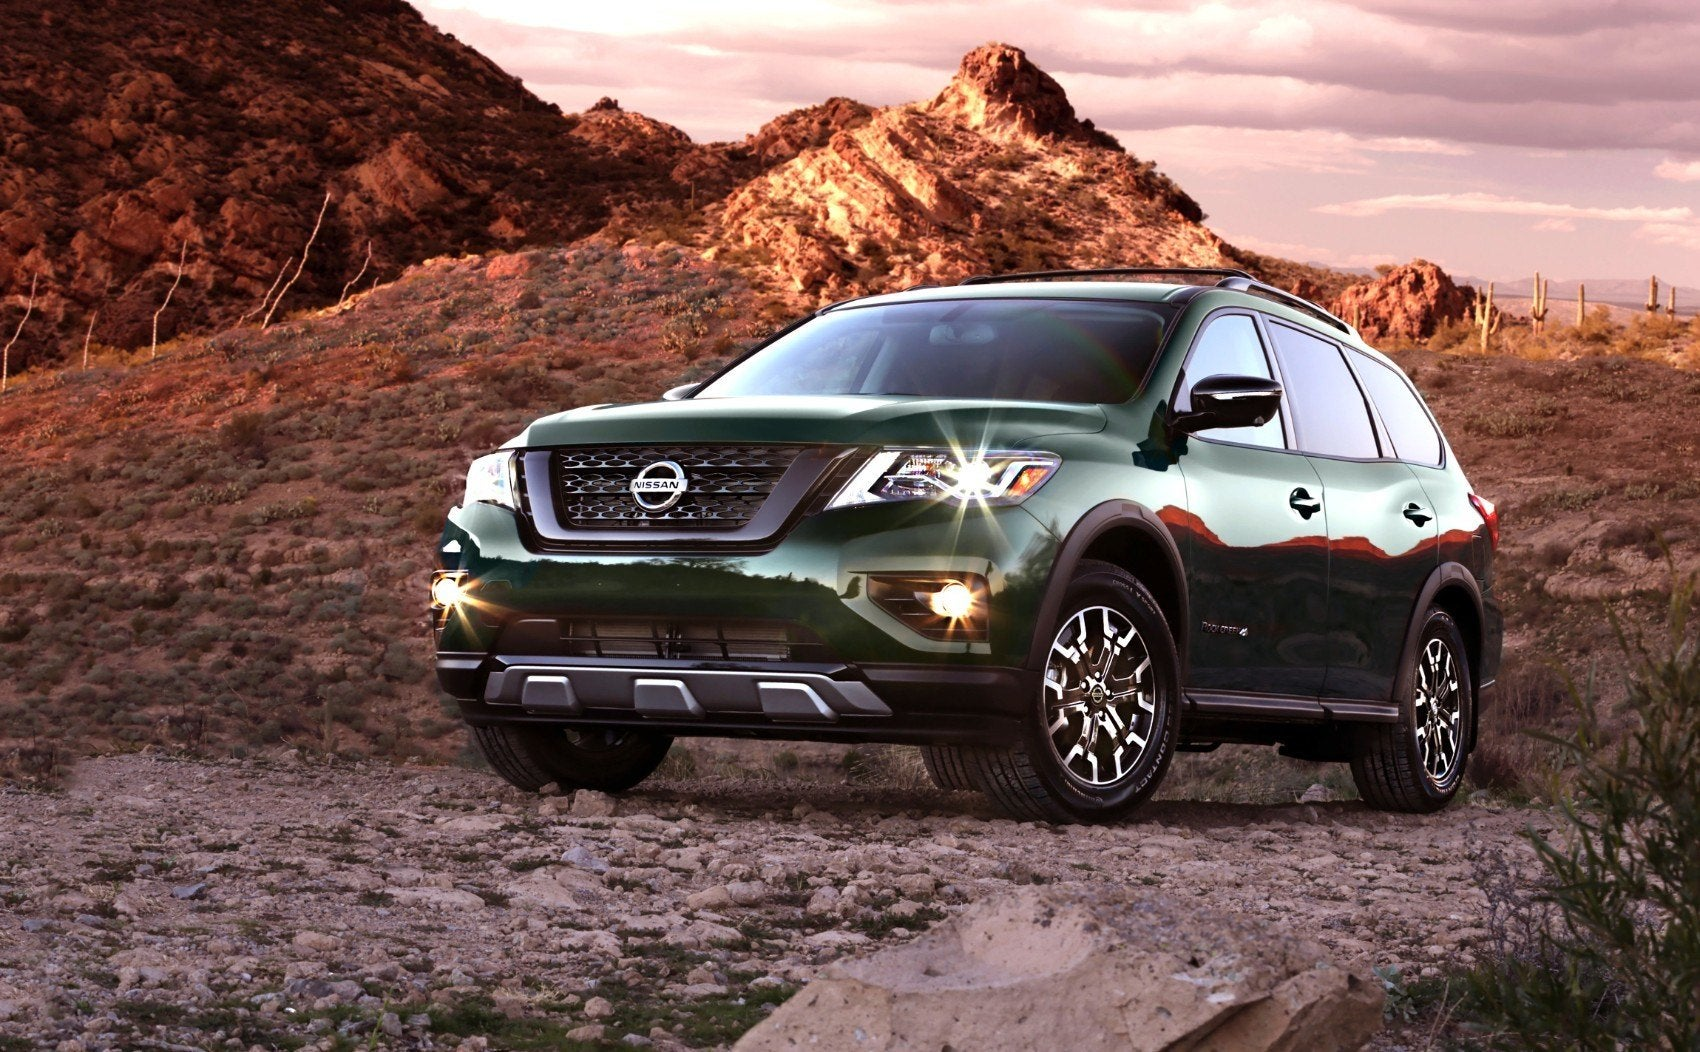 Nissan Pathfinder Rock Creek 22